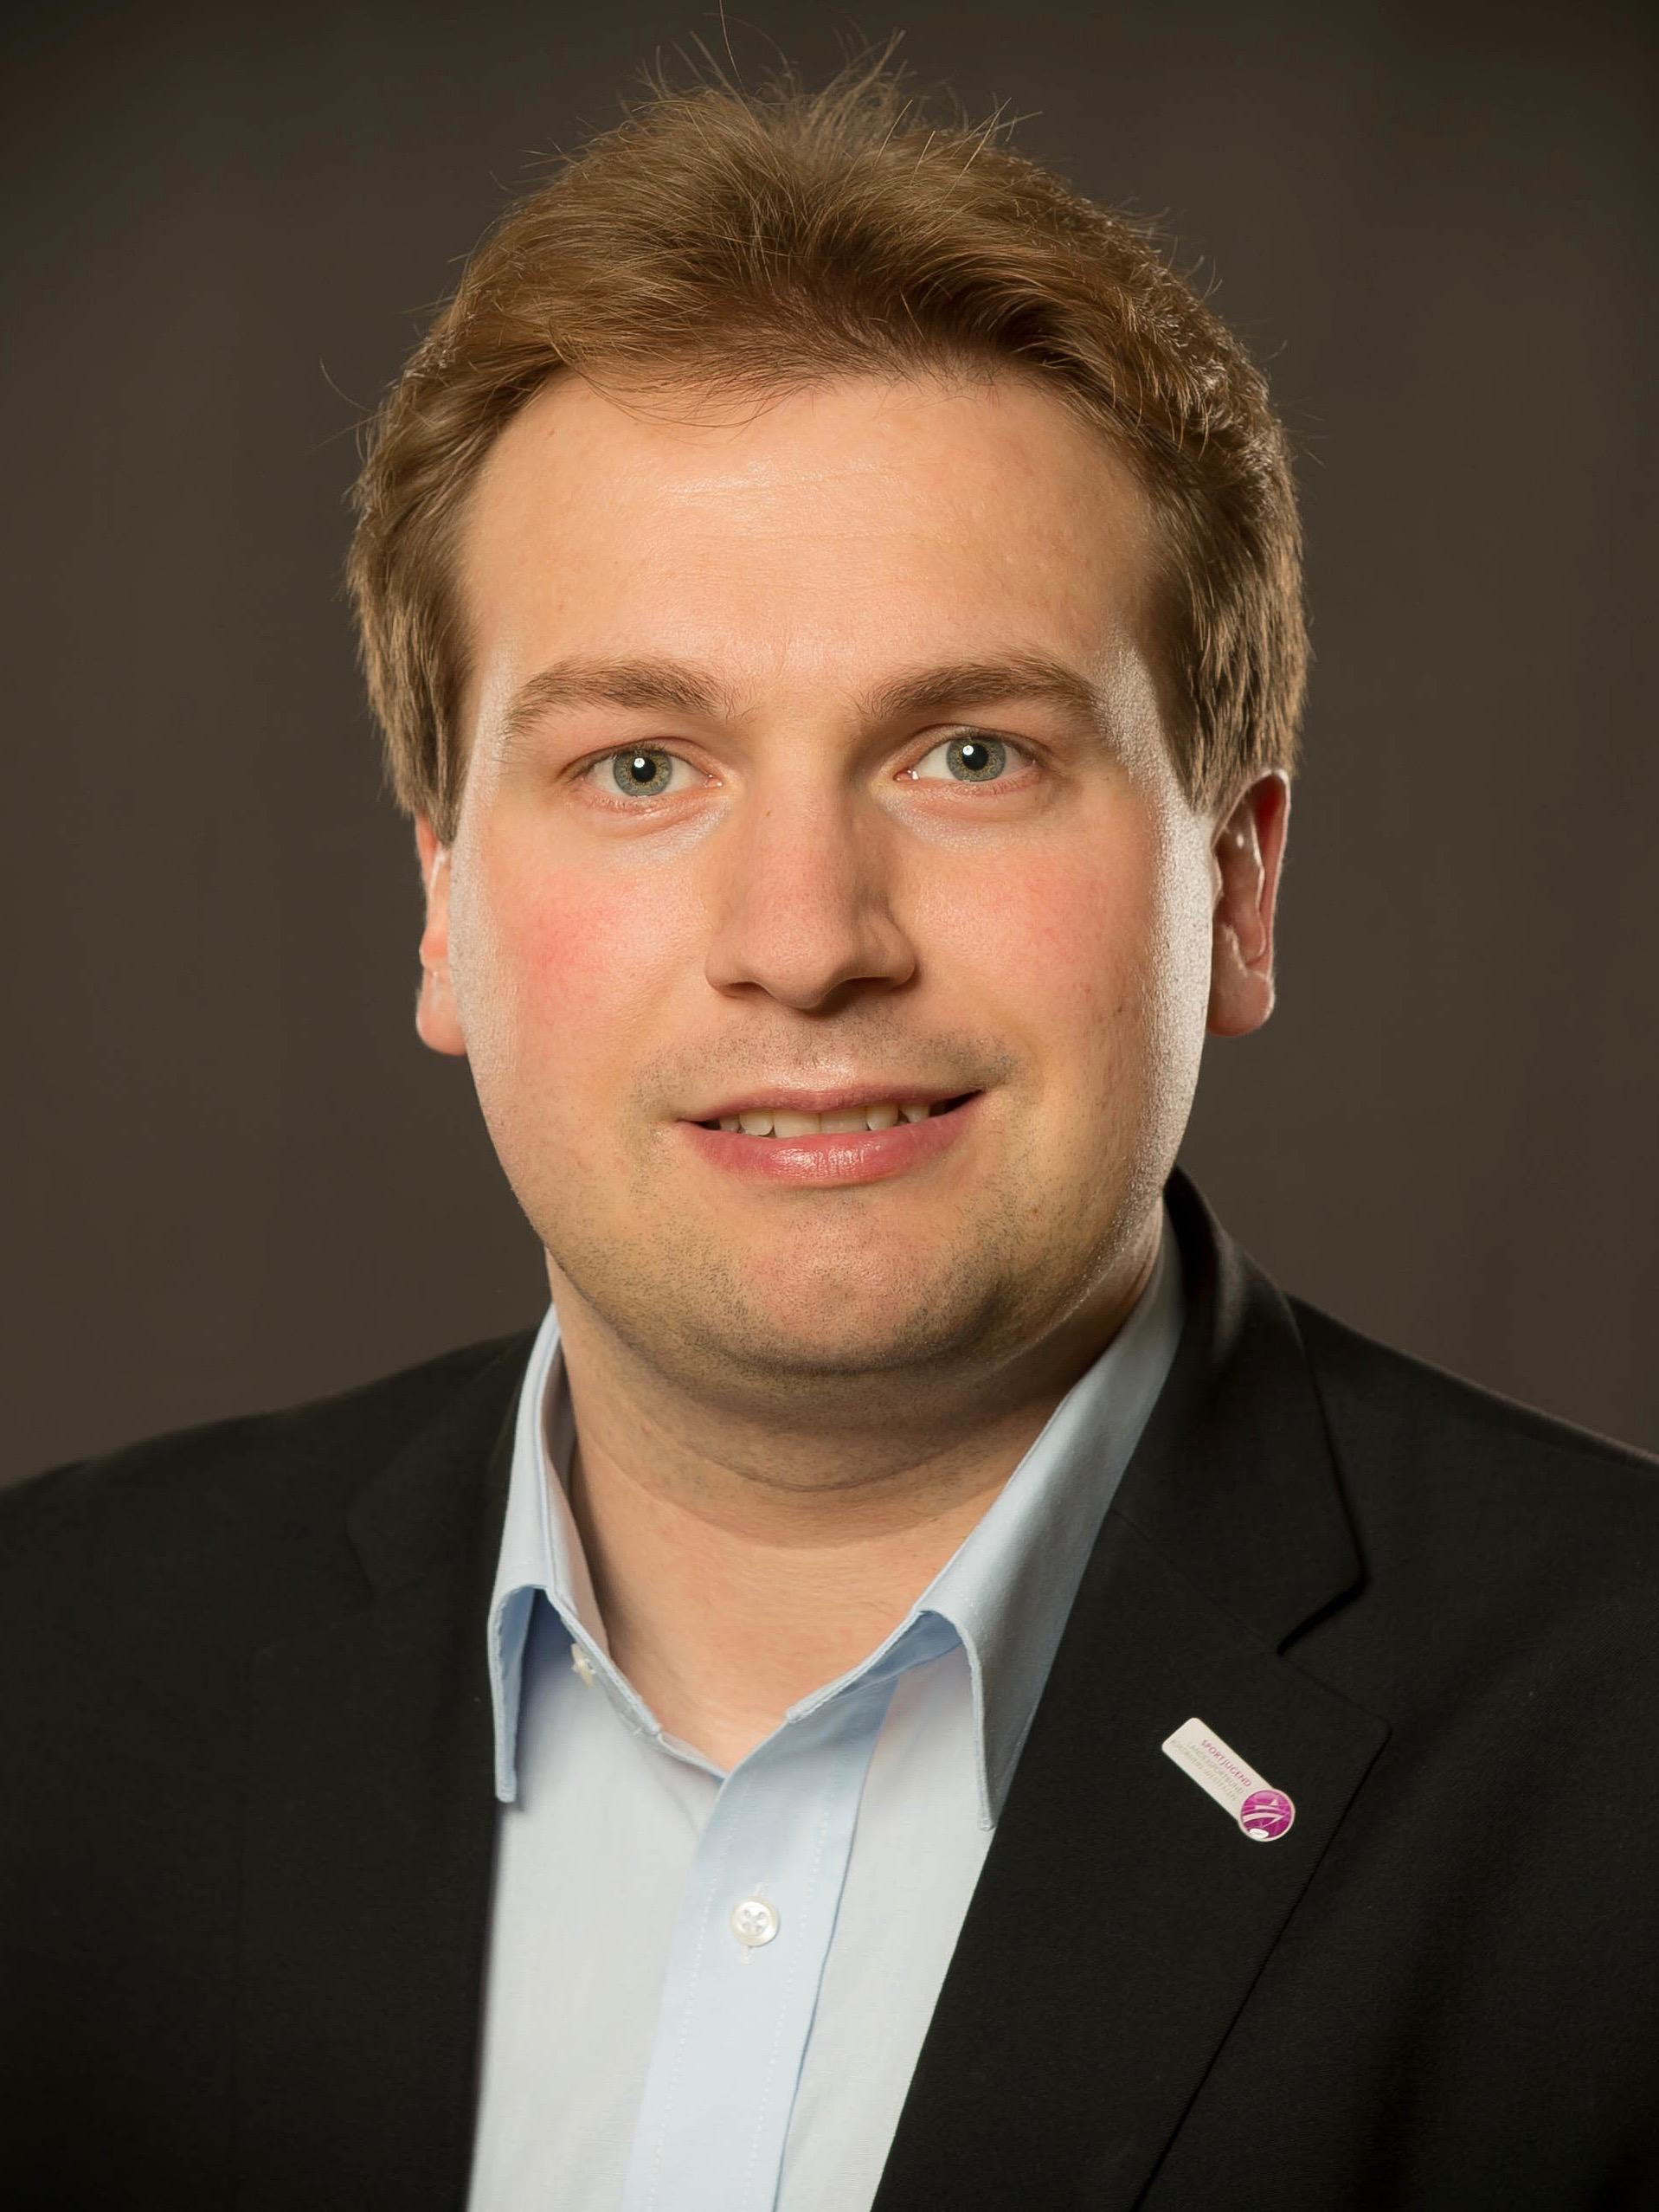 Jens Wortmann